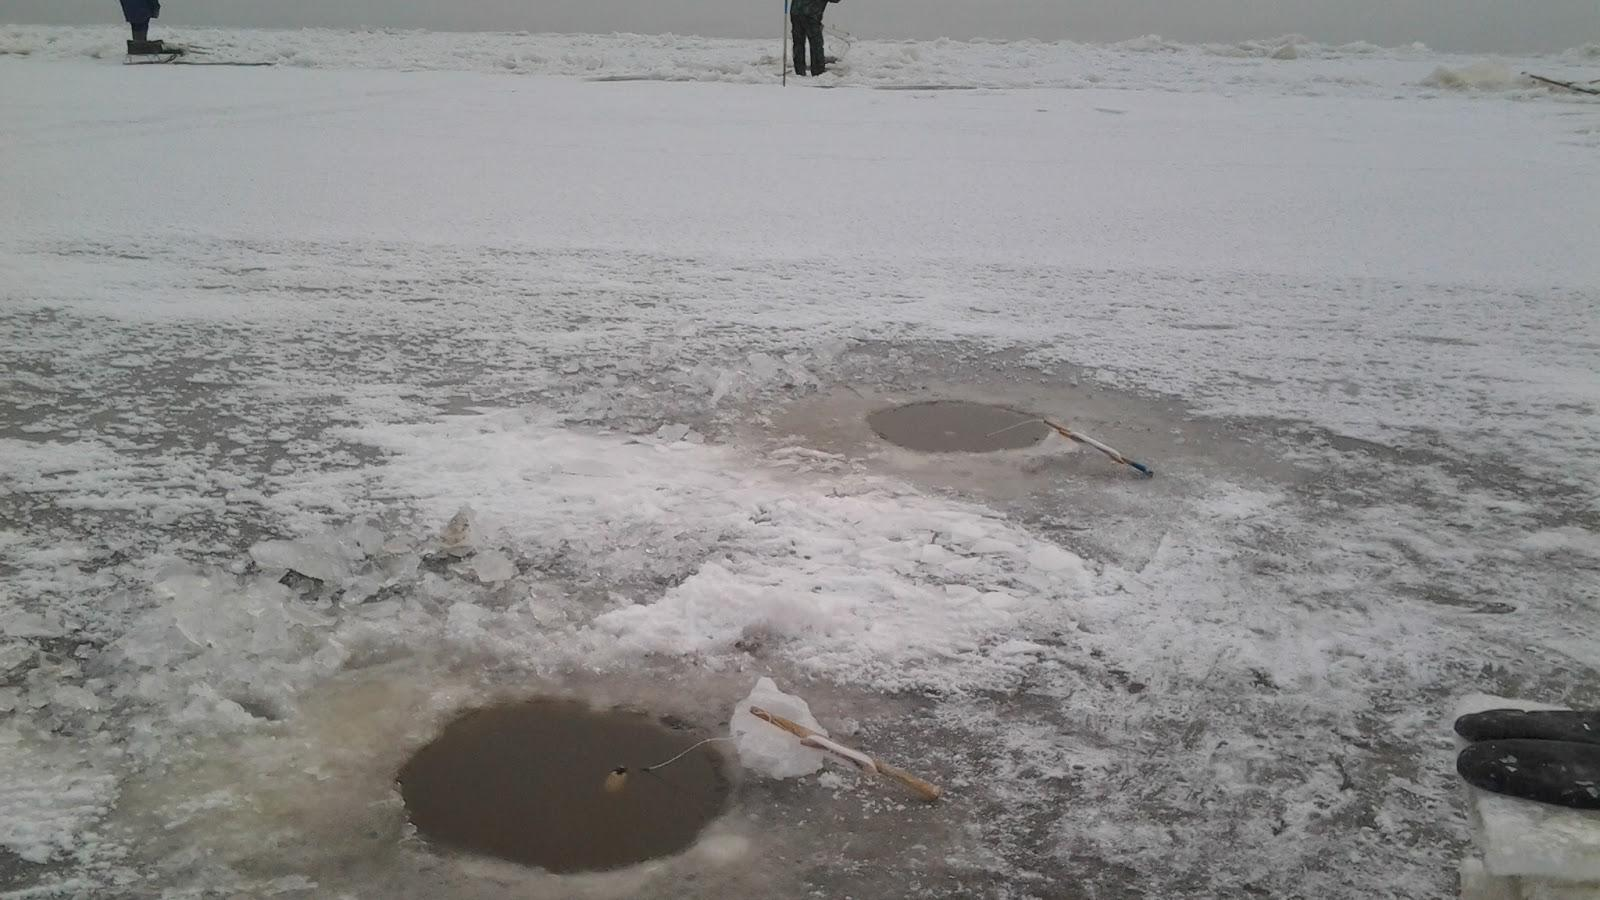 На реке Шексна мужчина на глазах других рыбаков провалился под лед